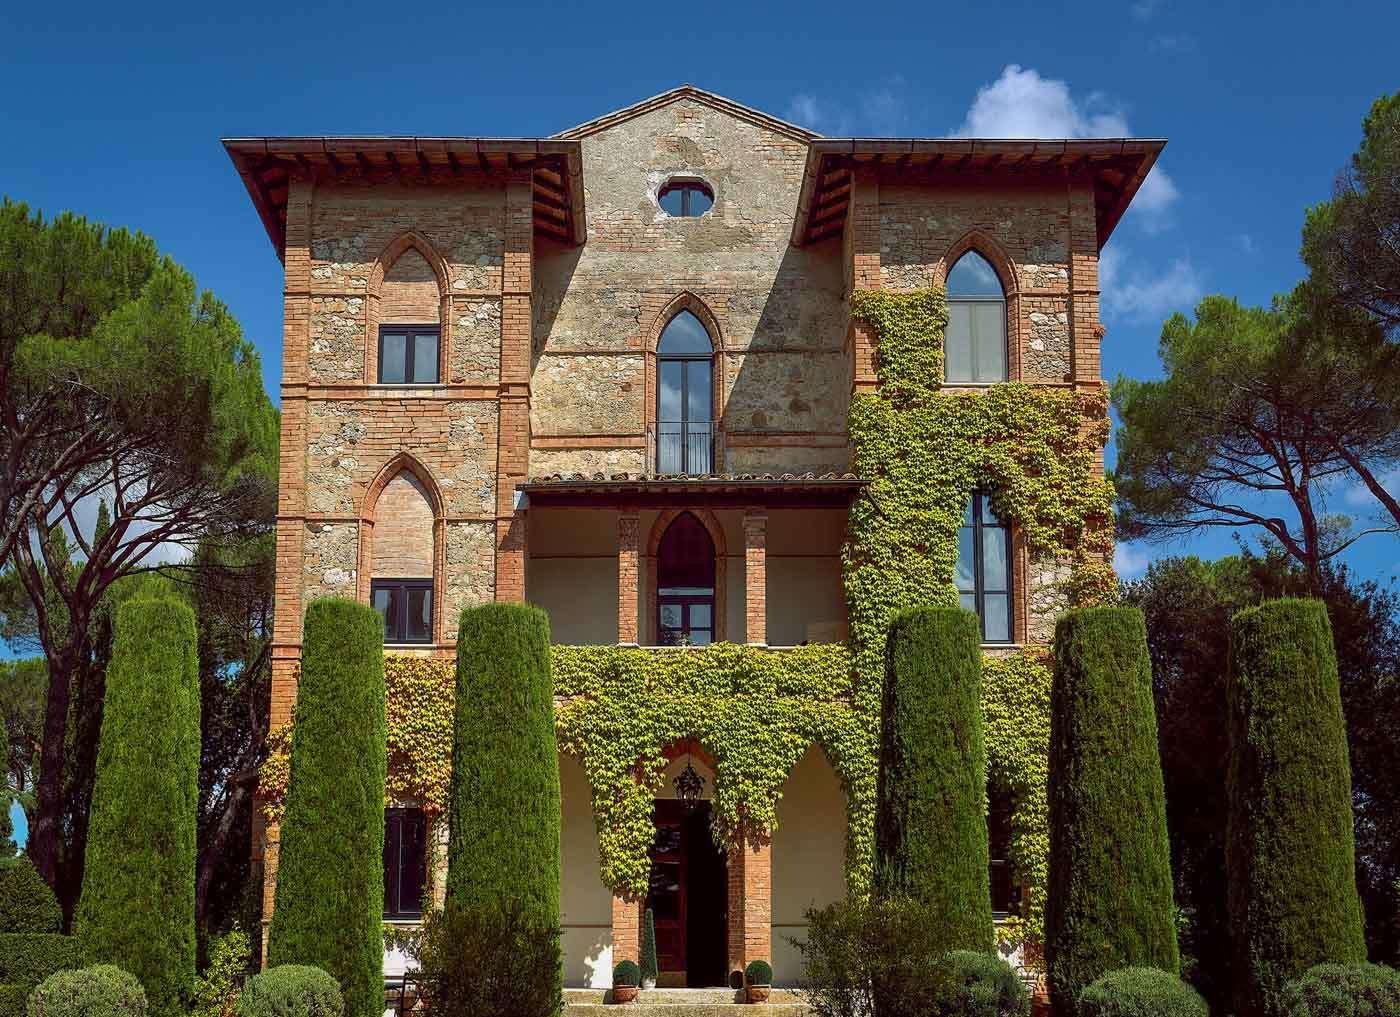 Luxury vacation rentals europe - Italy - Tuscany - Val dorcia - Araldica - Image 1/32